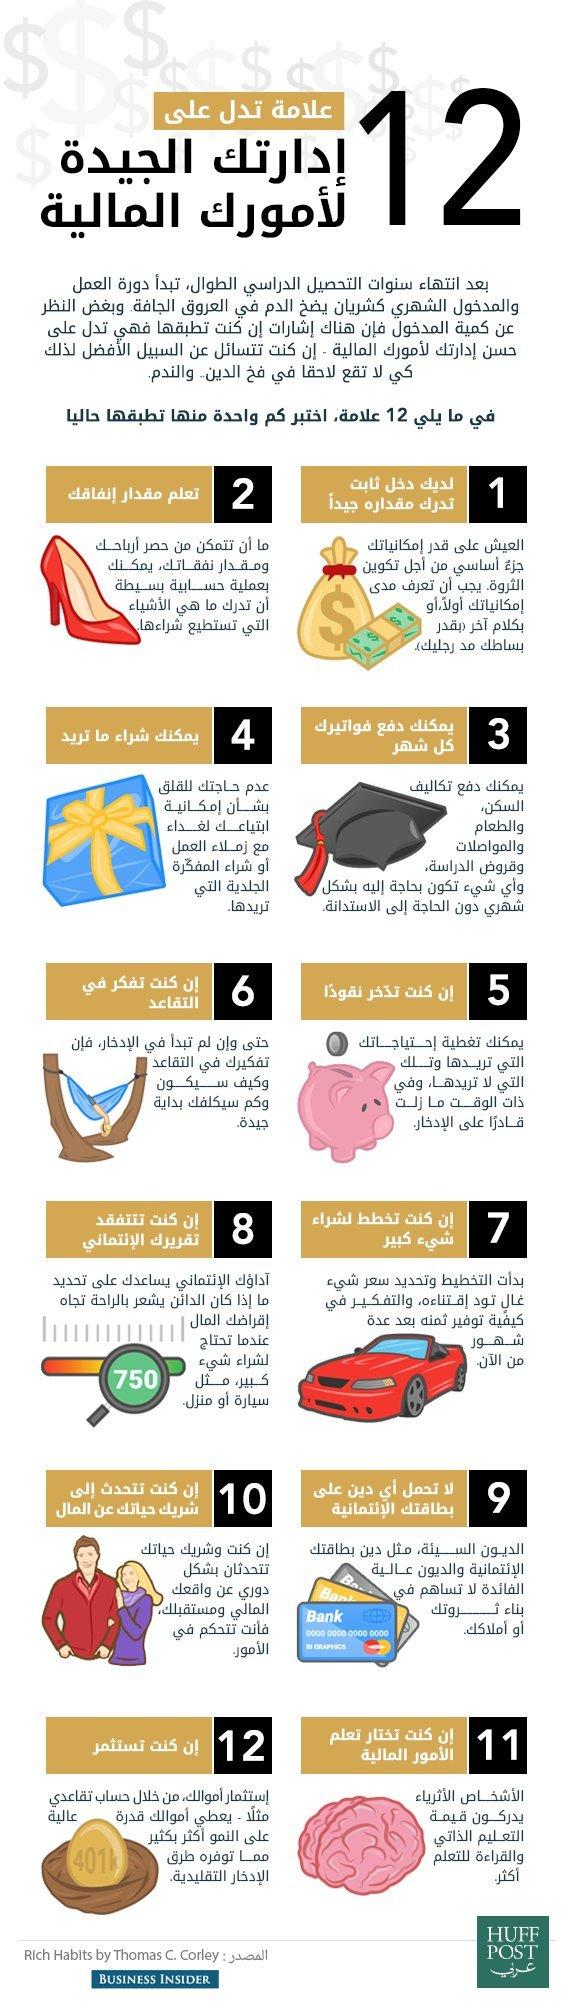 12 ways money managment